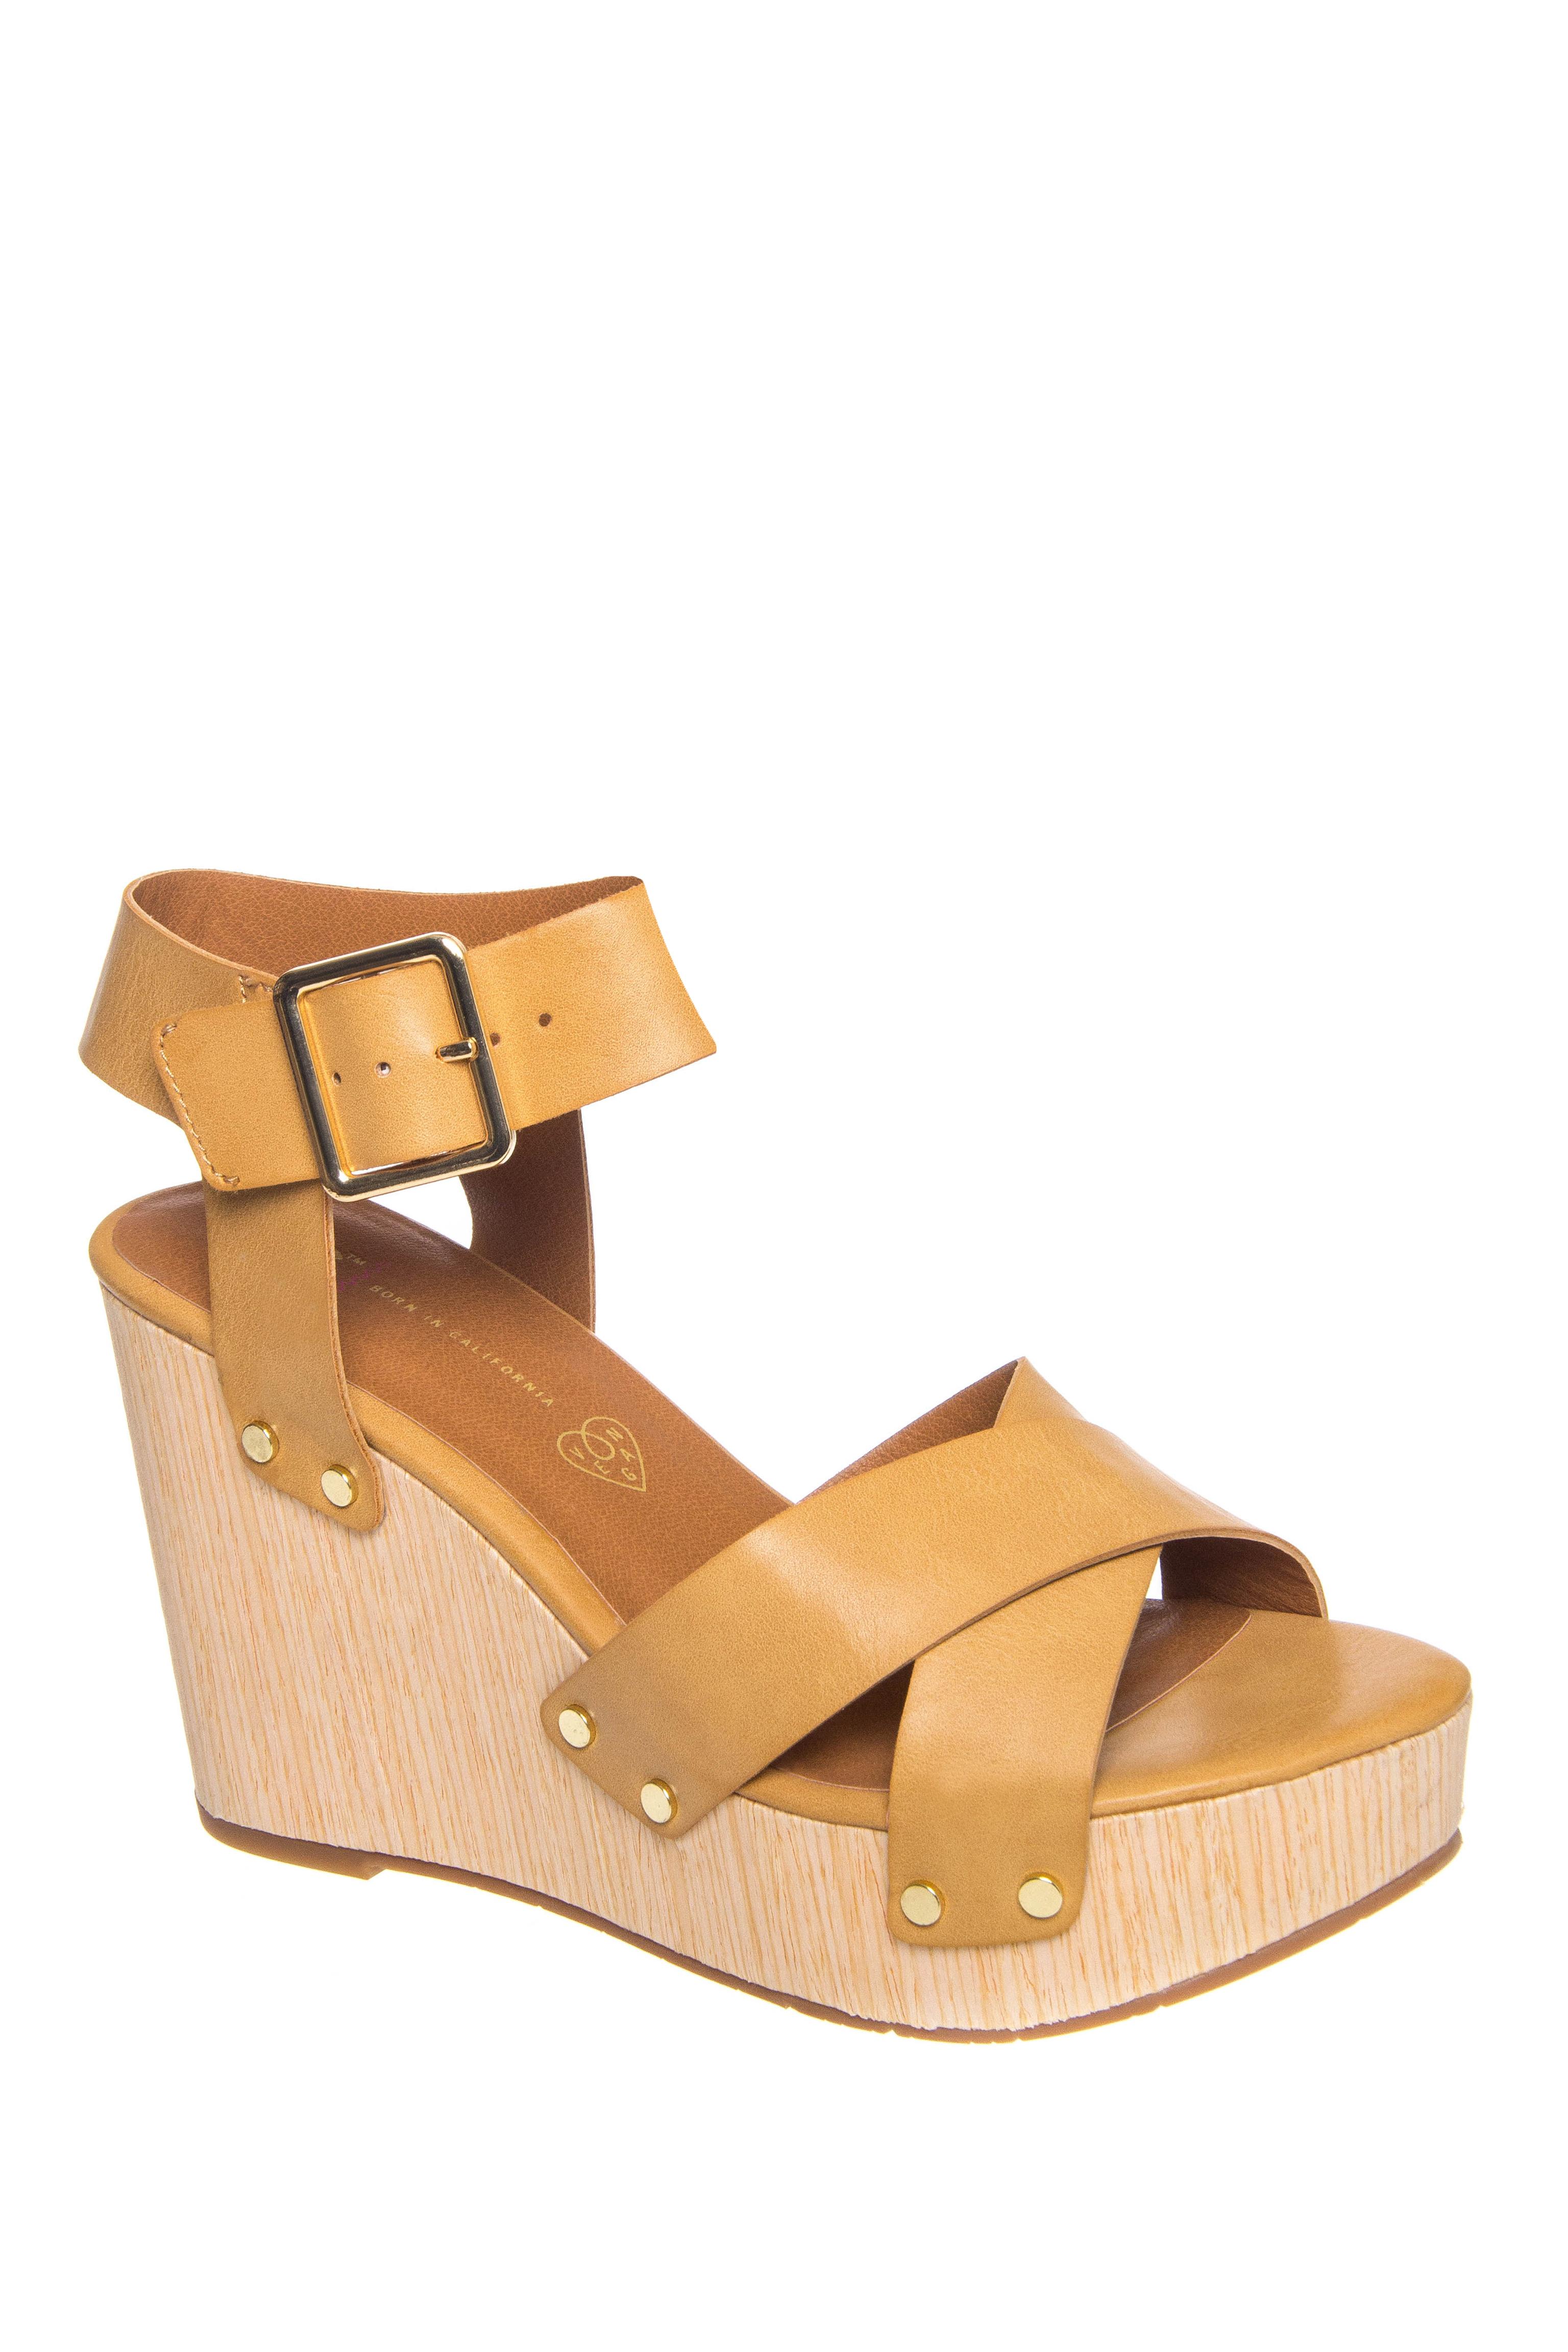 BC Footwear Teeny High Wedge Platform Sandals - Tan